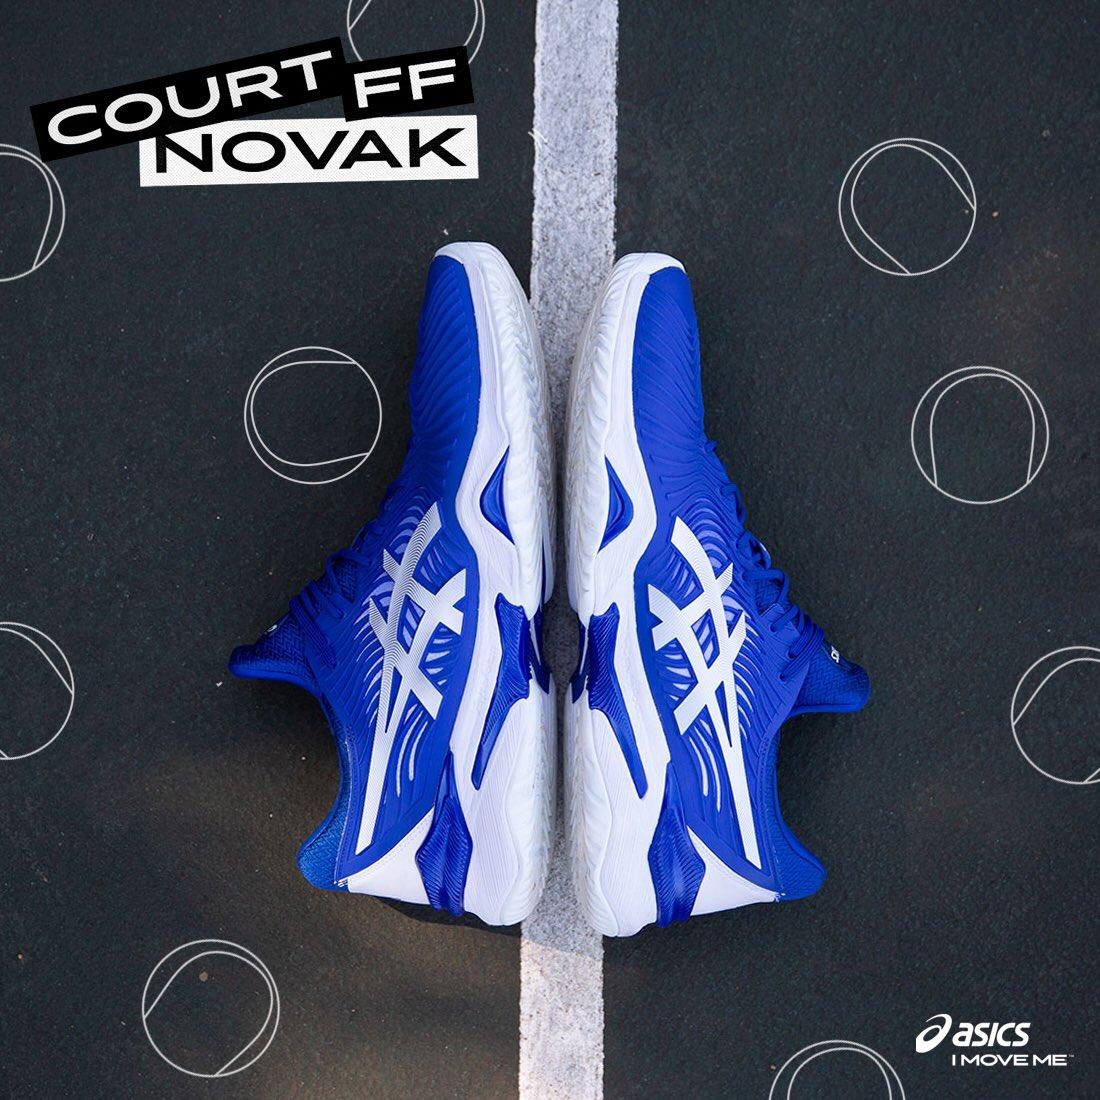 NovakTalk Court Ff Asics Court NovakTalk Tennis Asics Ff MqVpUzS